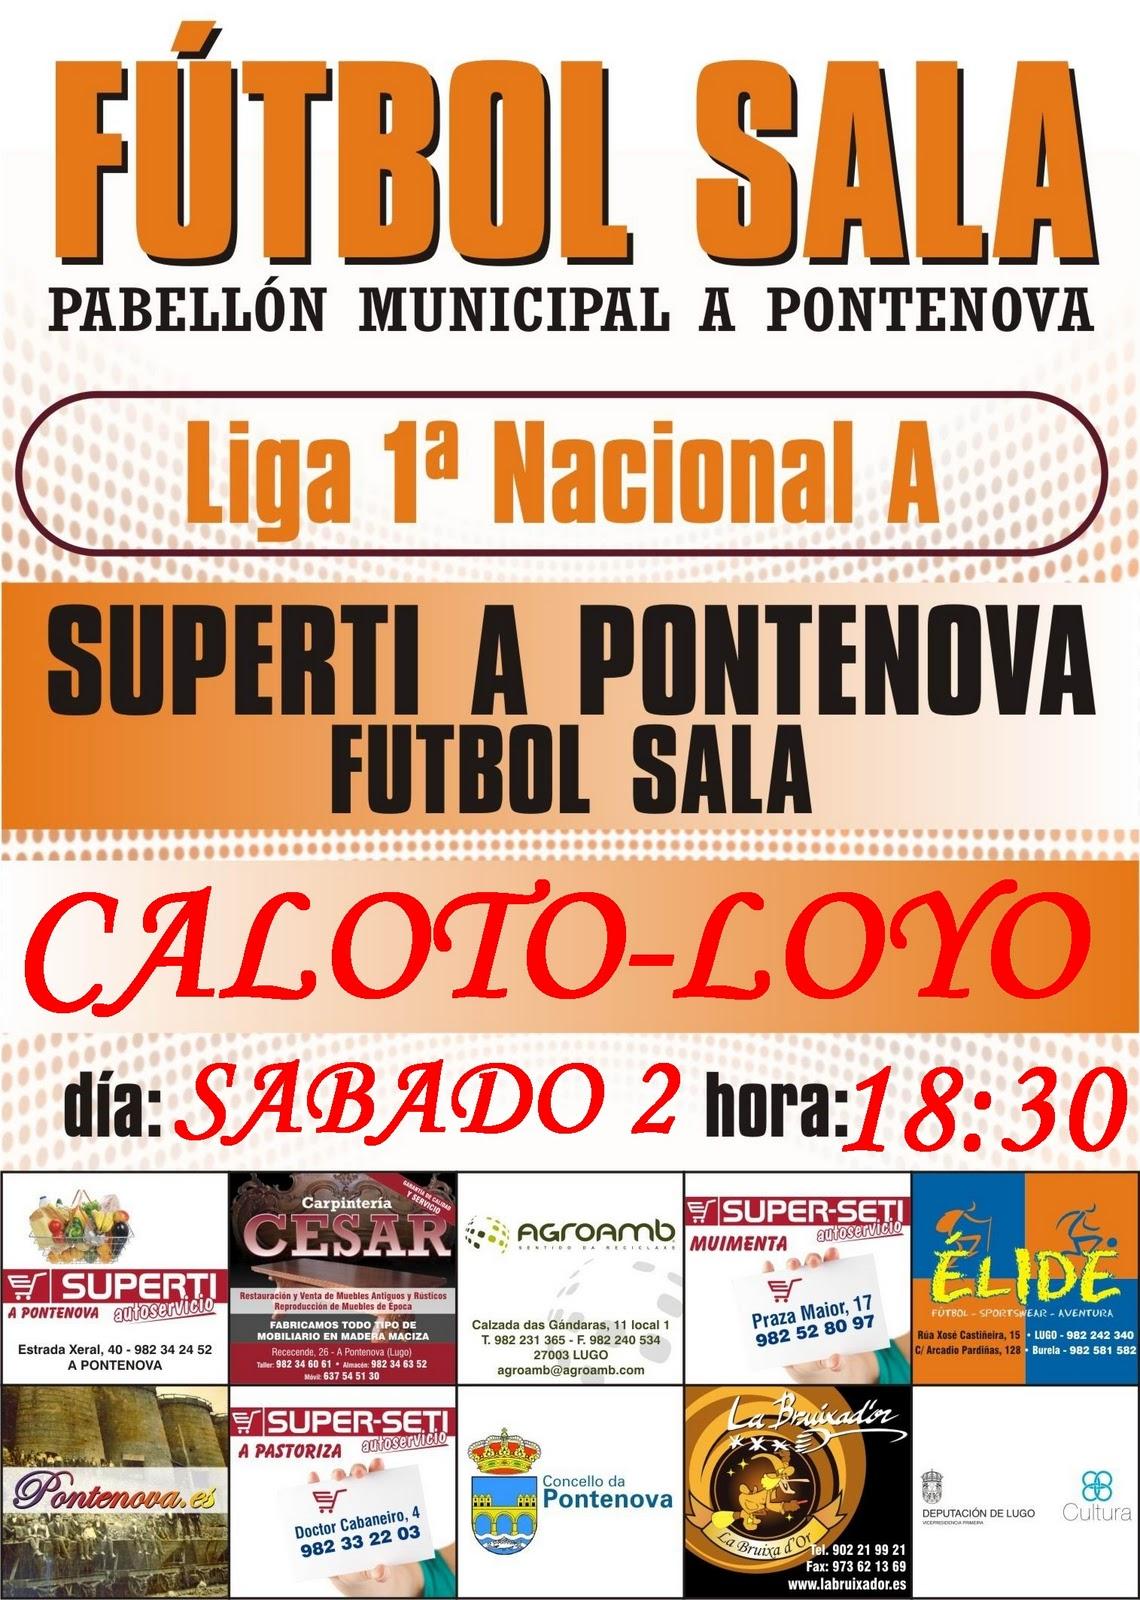 A Pontenova Septiembre 2010 # Muebles Javi Vegadeo